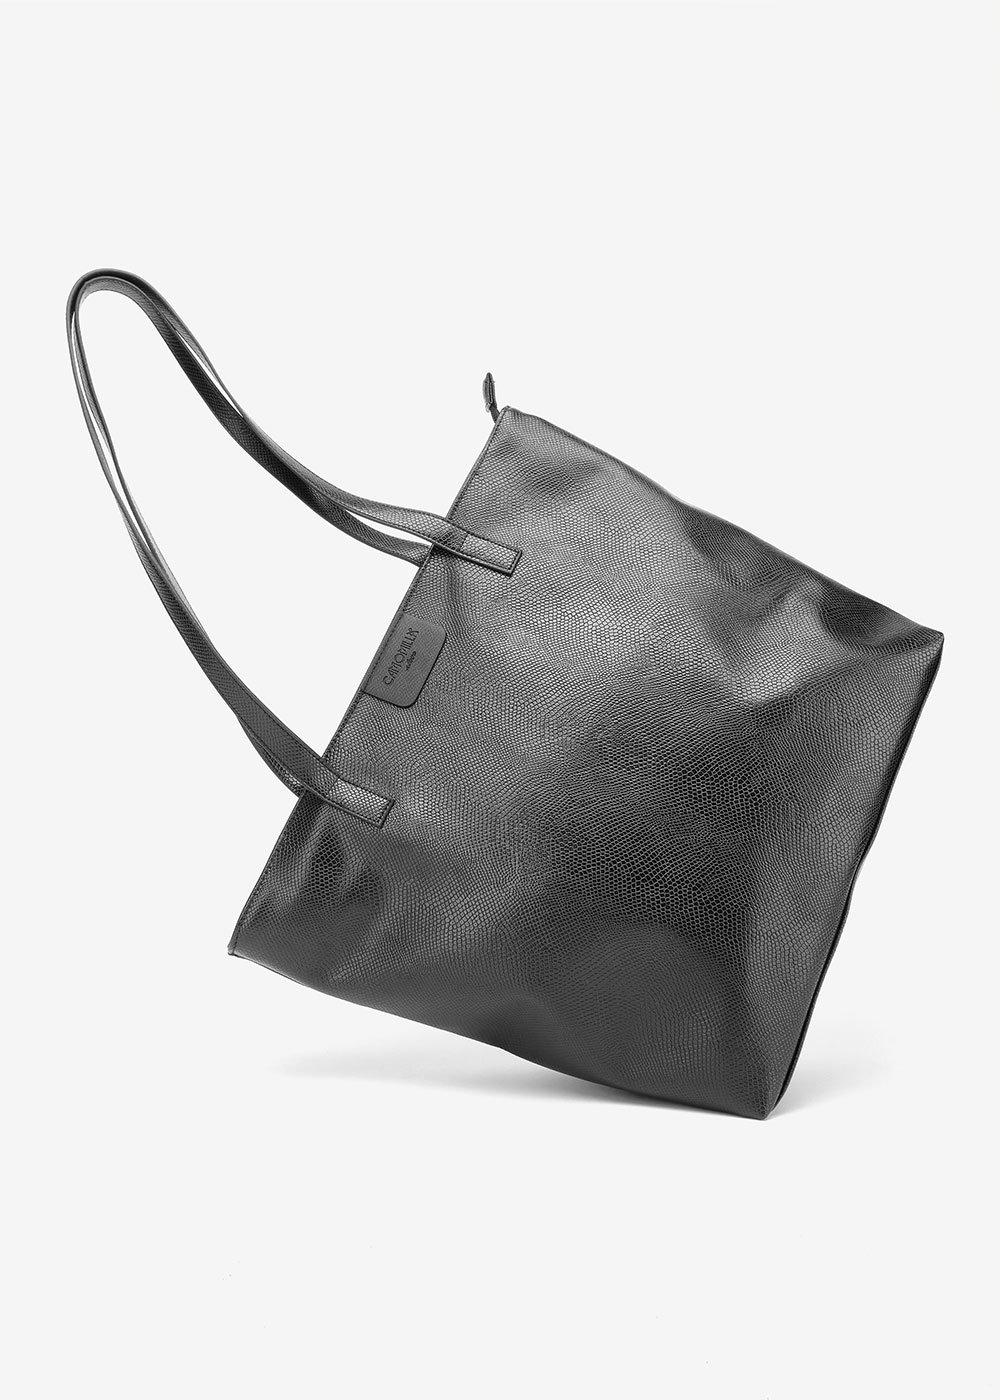 Shopping bag Badia stampa pitone - Black - Donna